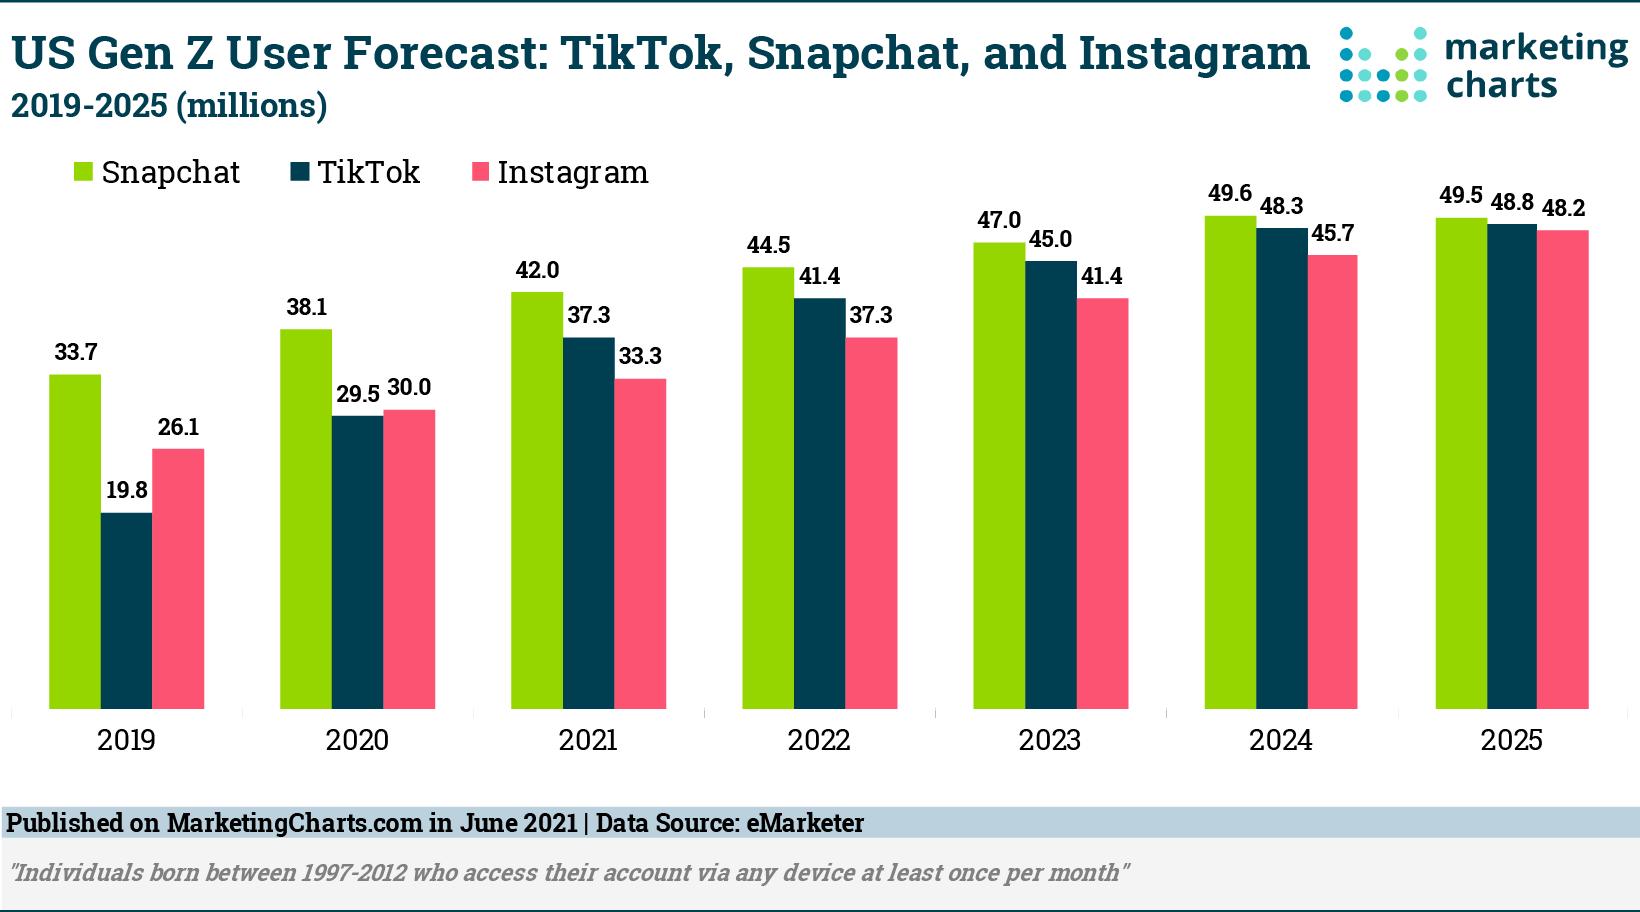 Report: TikTok Now More Popular Than Instagram Among US Gen Z Consumers